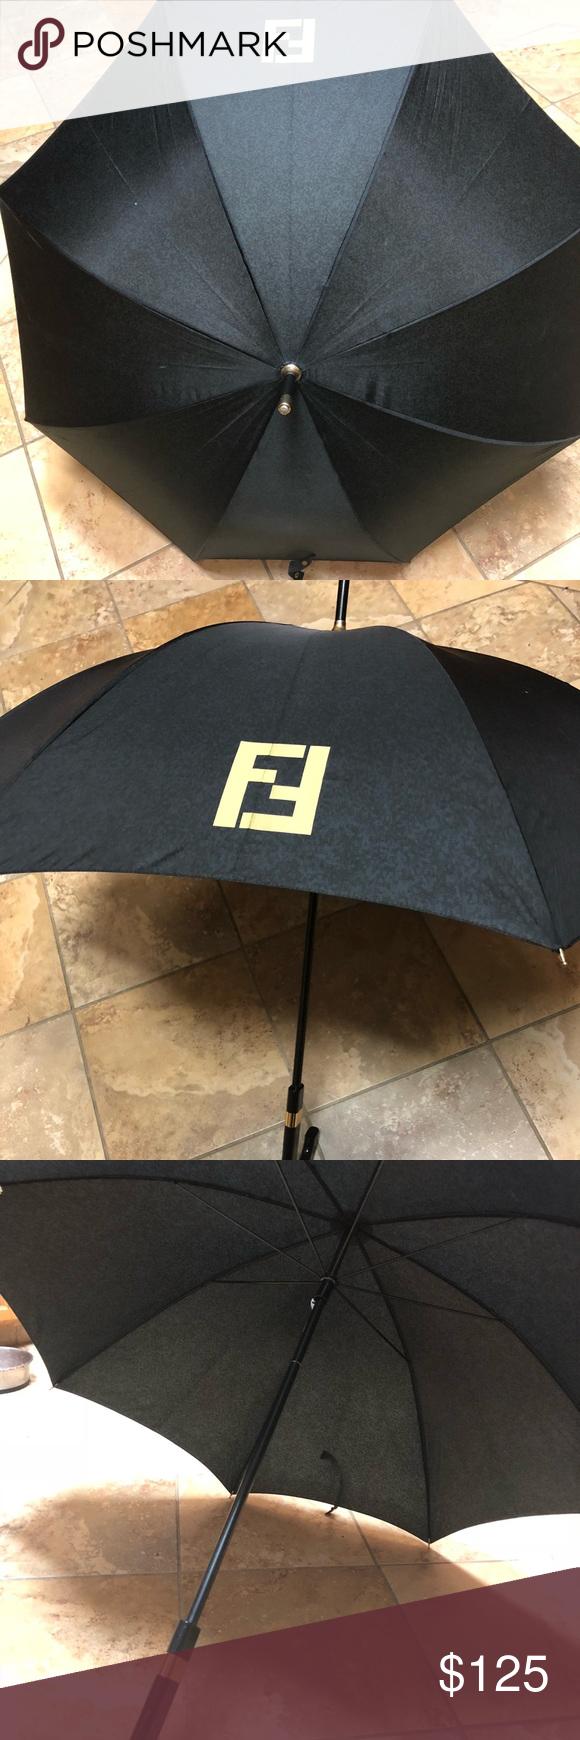 Vintage Authentic Fendi Umbrella This Item Was Offered In The Early 90s And Is Vintage Fendi Black Wood Handle Umbrella Good Used Cond Fendi Umbrella Vintage